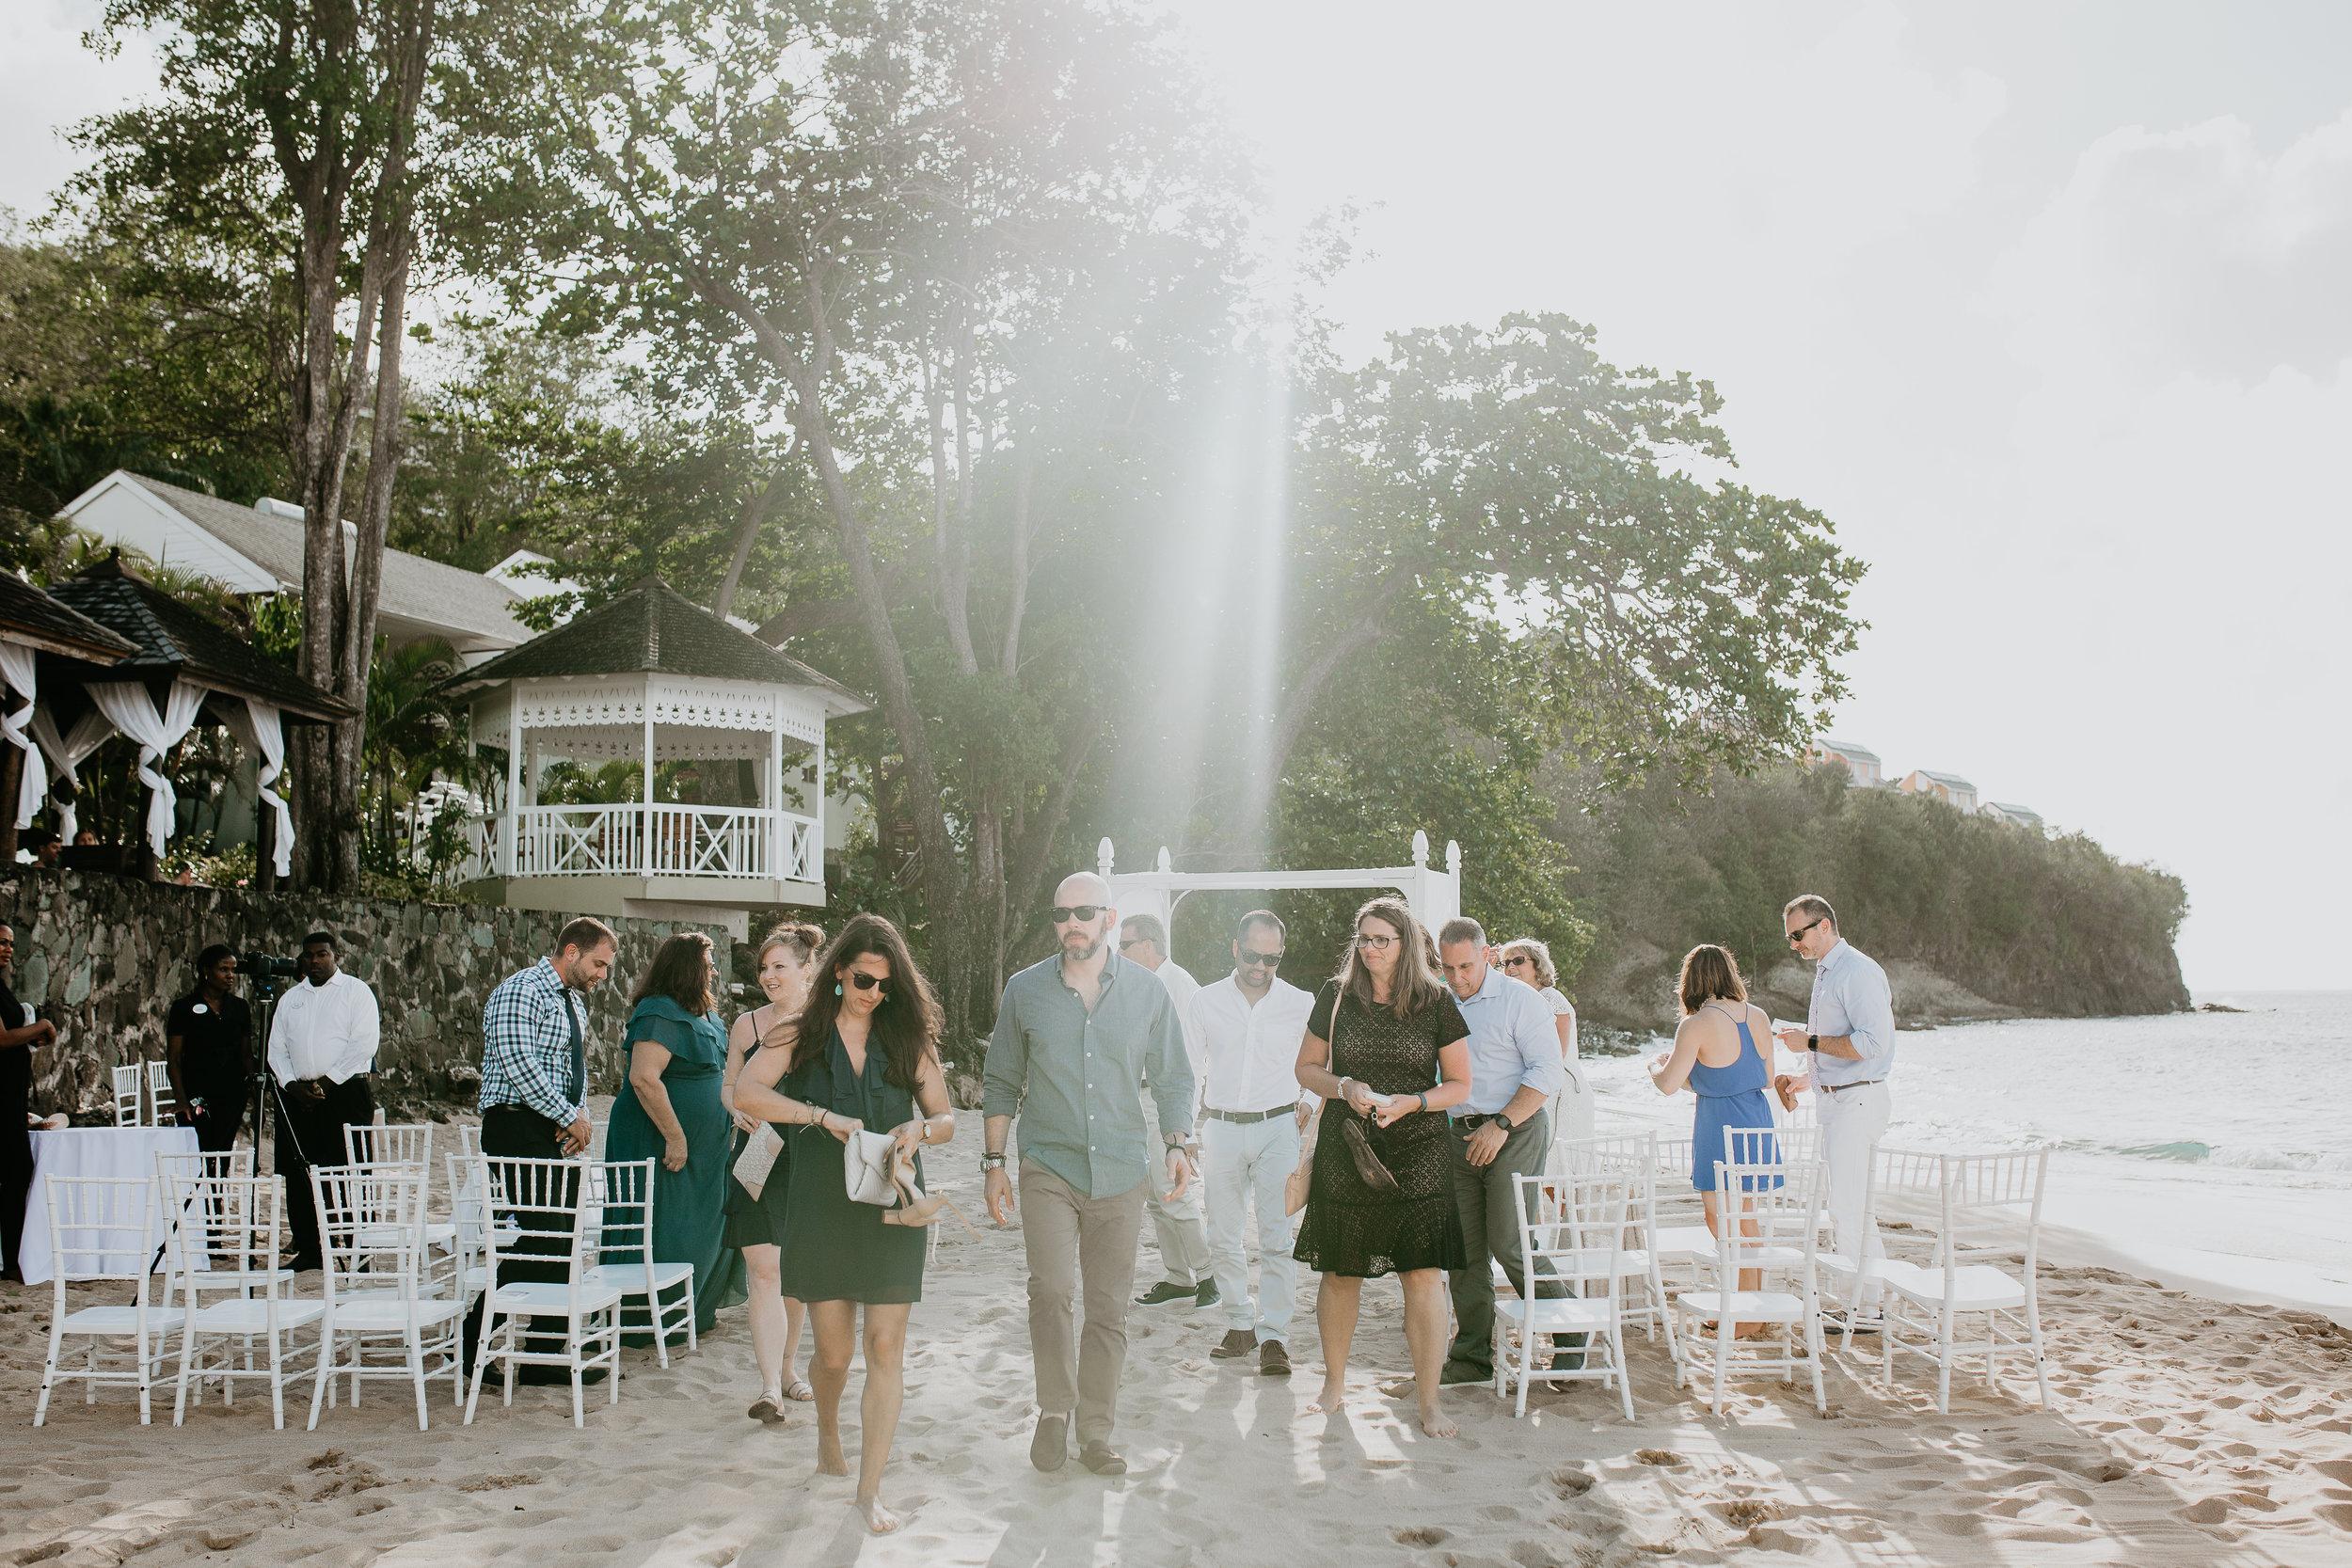 nicole-daacke-photography-destination-wedding-in-st-lucia-sandals-la-toc-intimate-island-wedding-carribean-elopement-photographer-chill-island-wedding-75.jpg